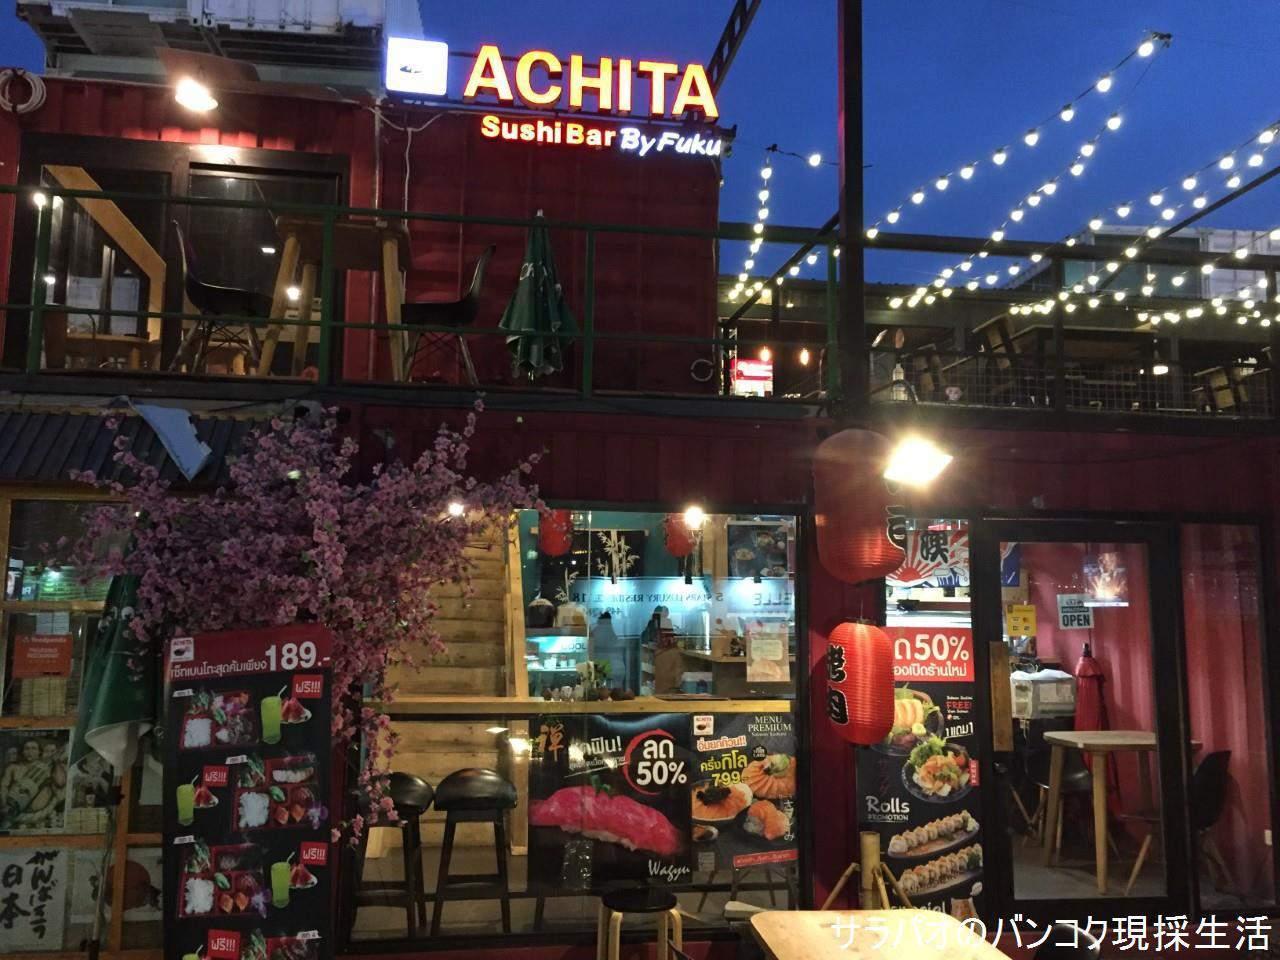 Achita_22.jpg